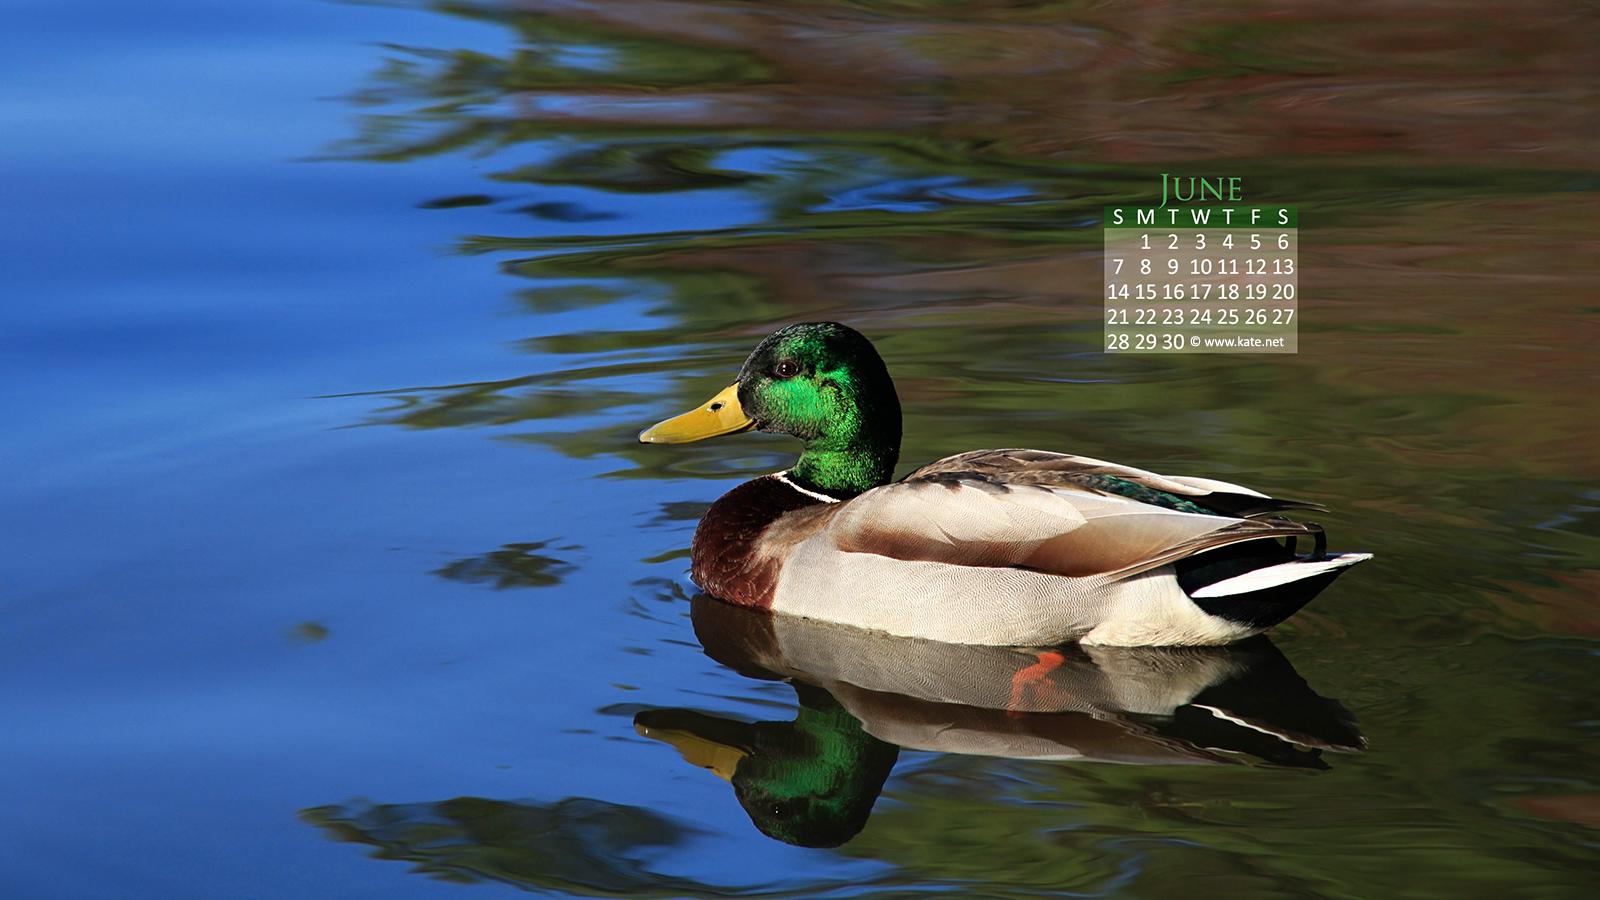 Calendar Wallpapers Desktop Wallpapers by Katenet 1600x900